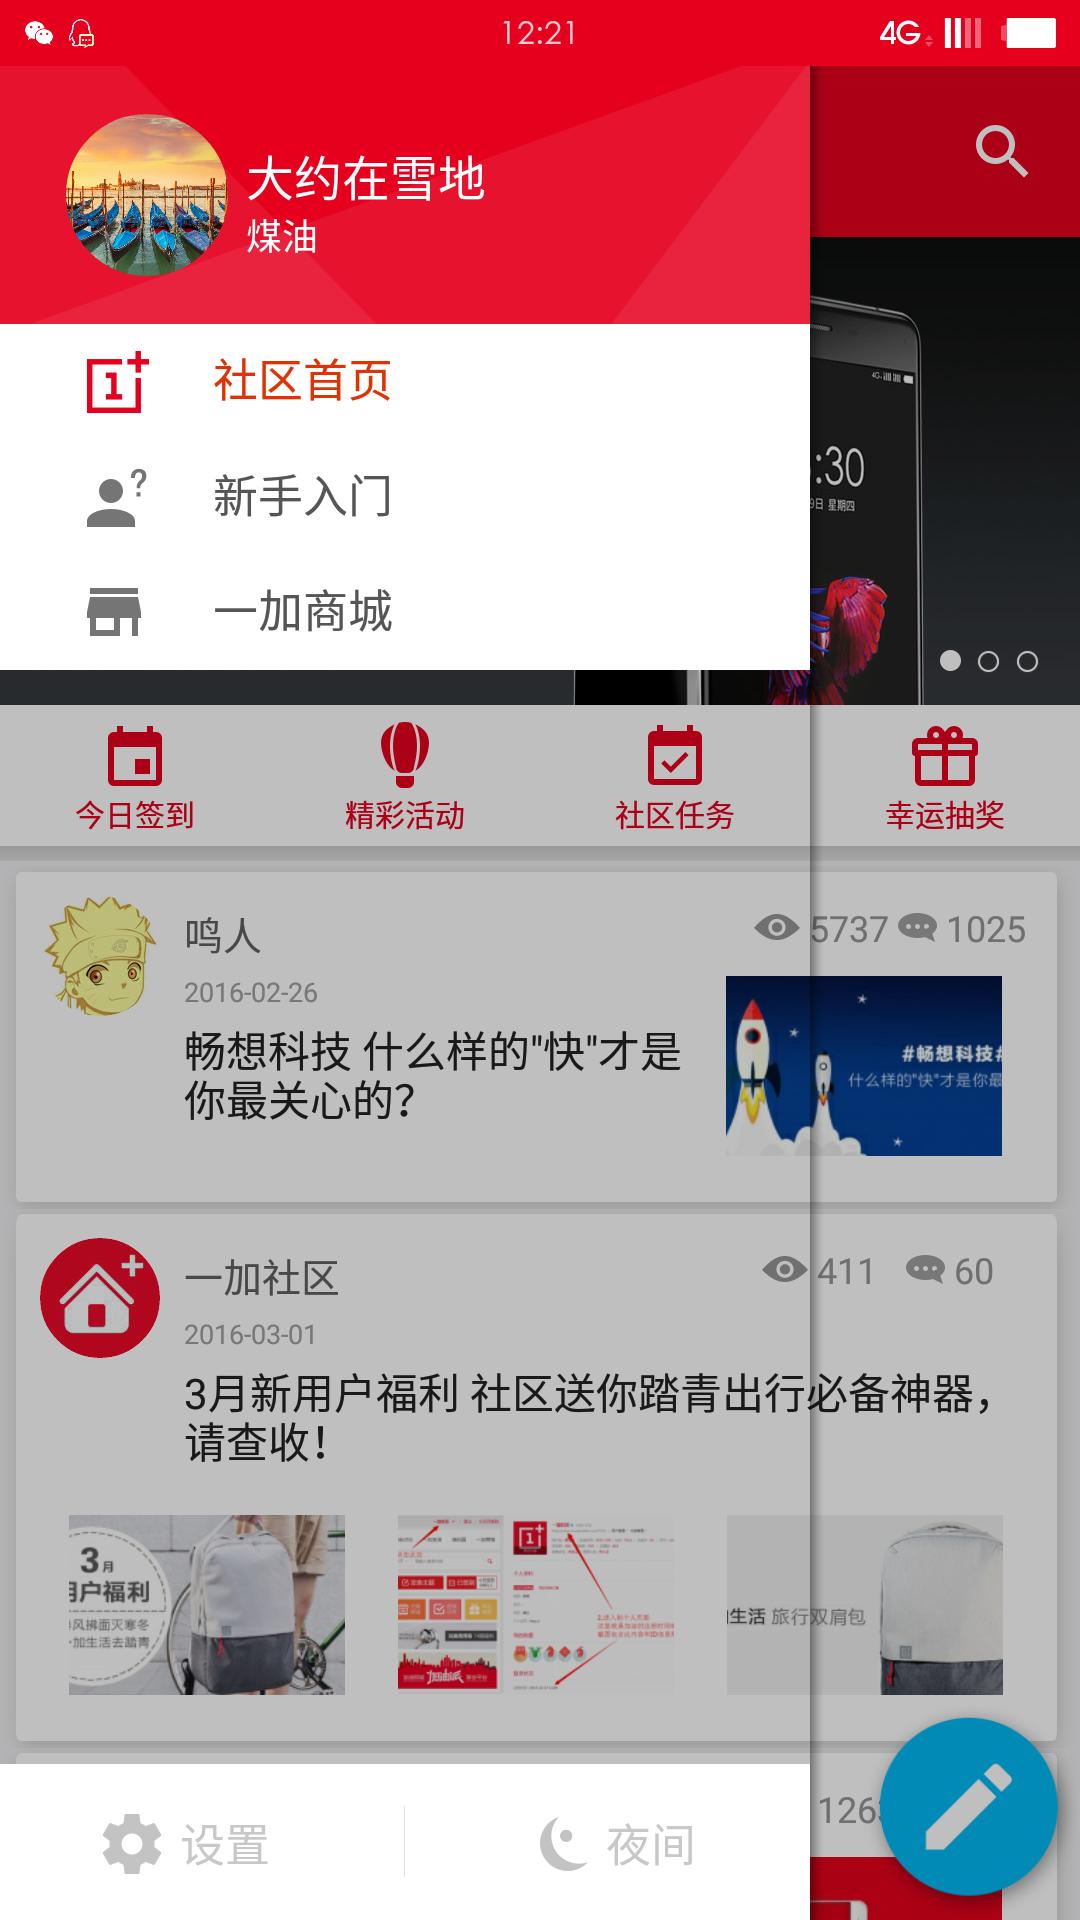 Screenshot_2016-03-01-12-21-47.png